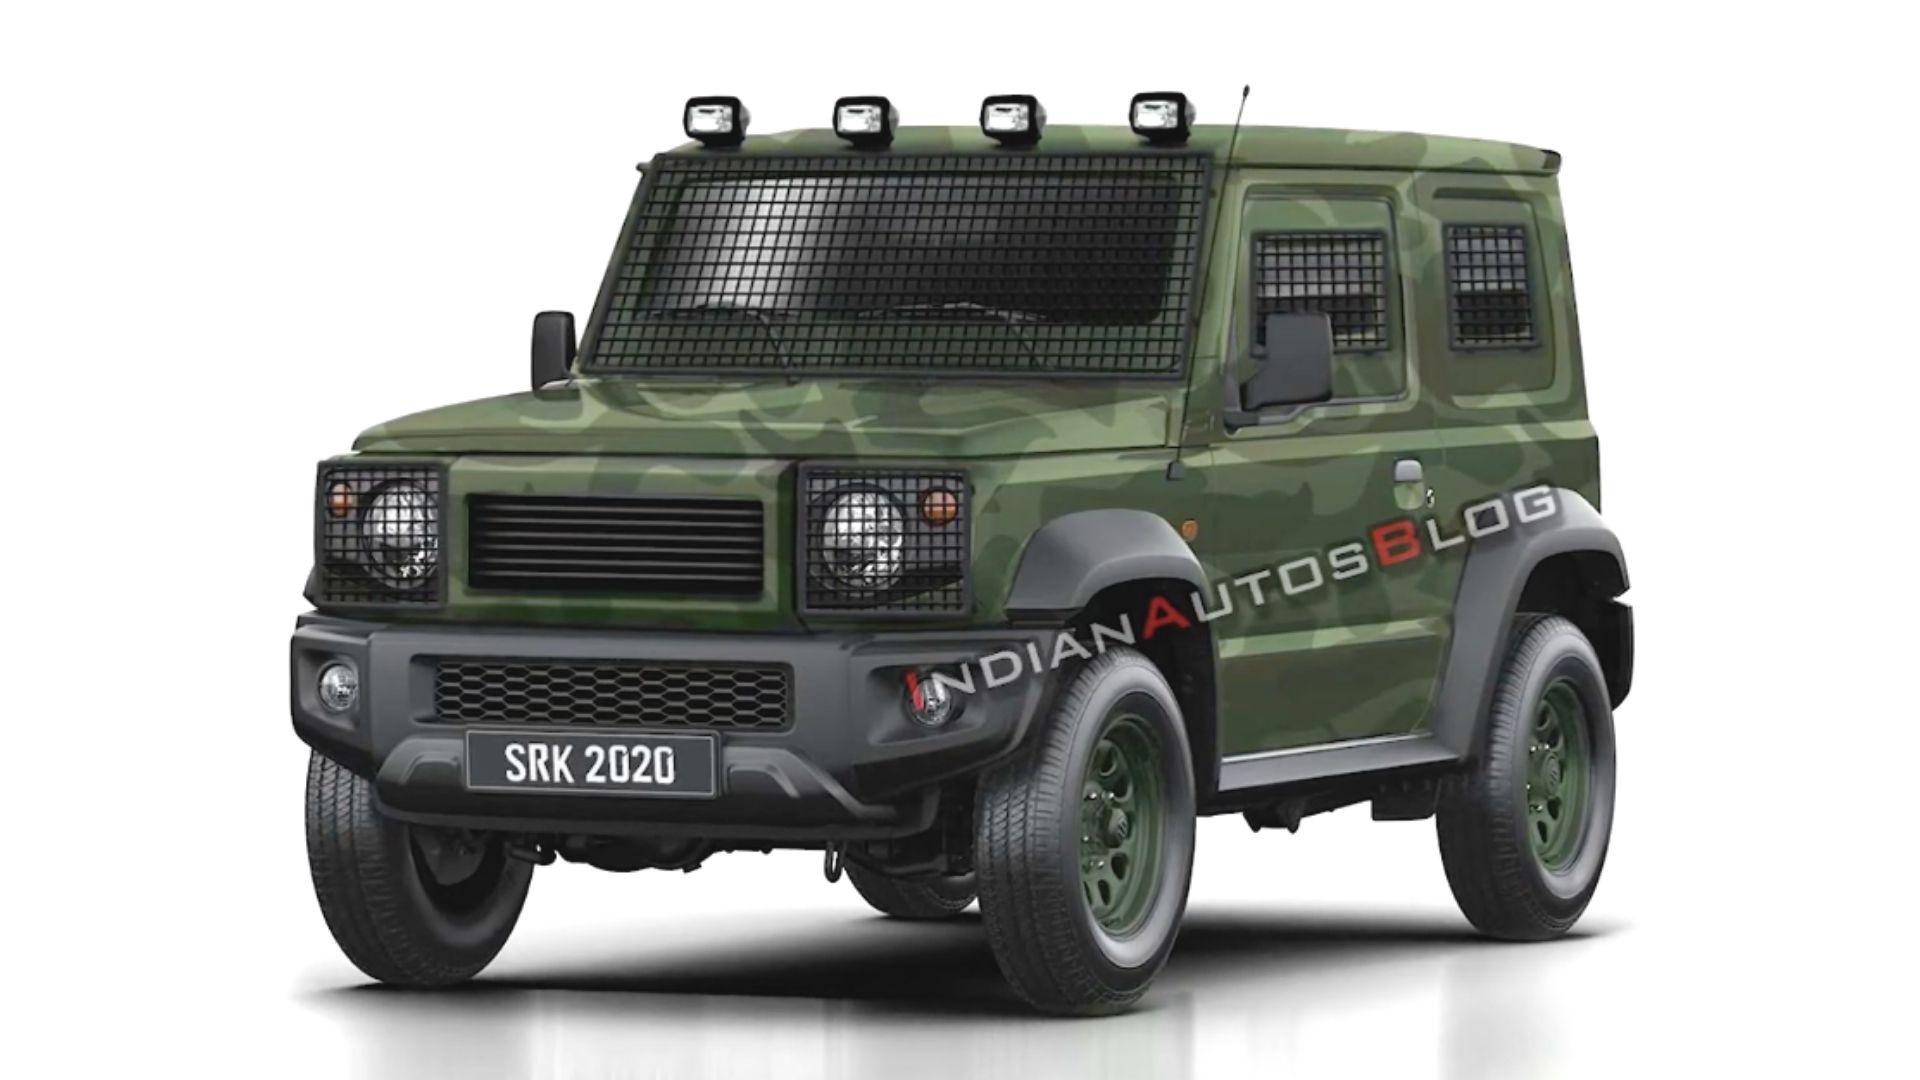 2021 Maruti Gypsy Army Model Visualized In New Rendering